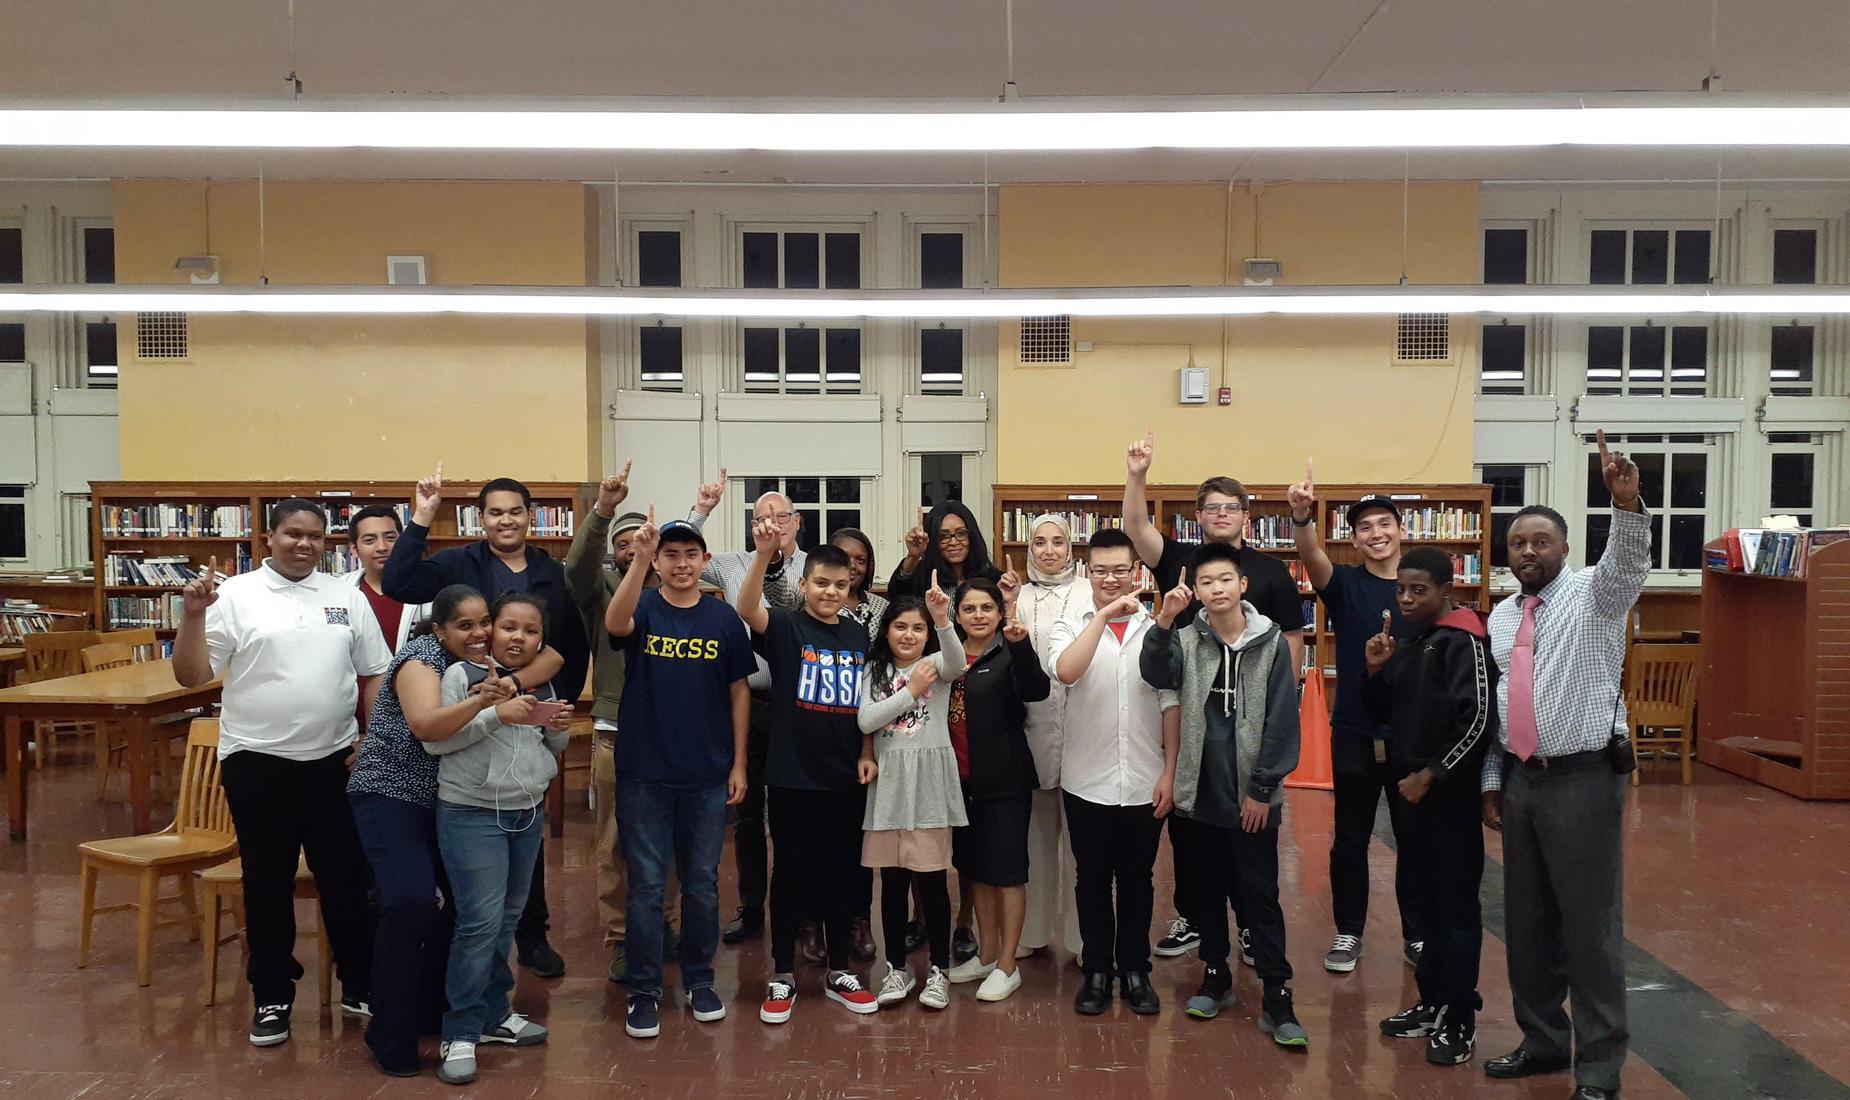 Students holding up #1 finger